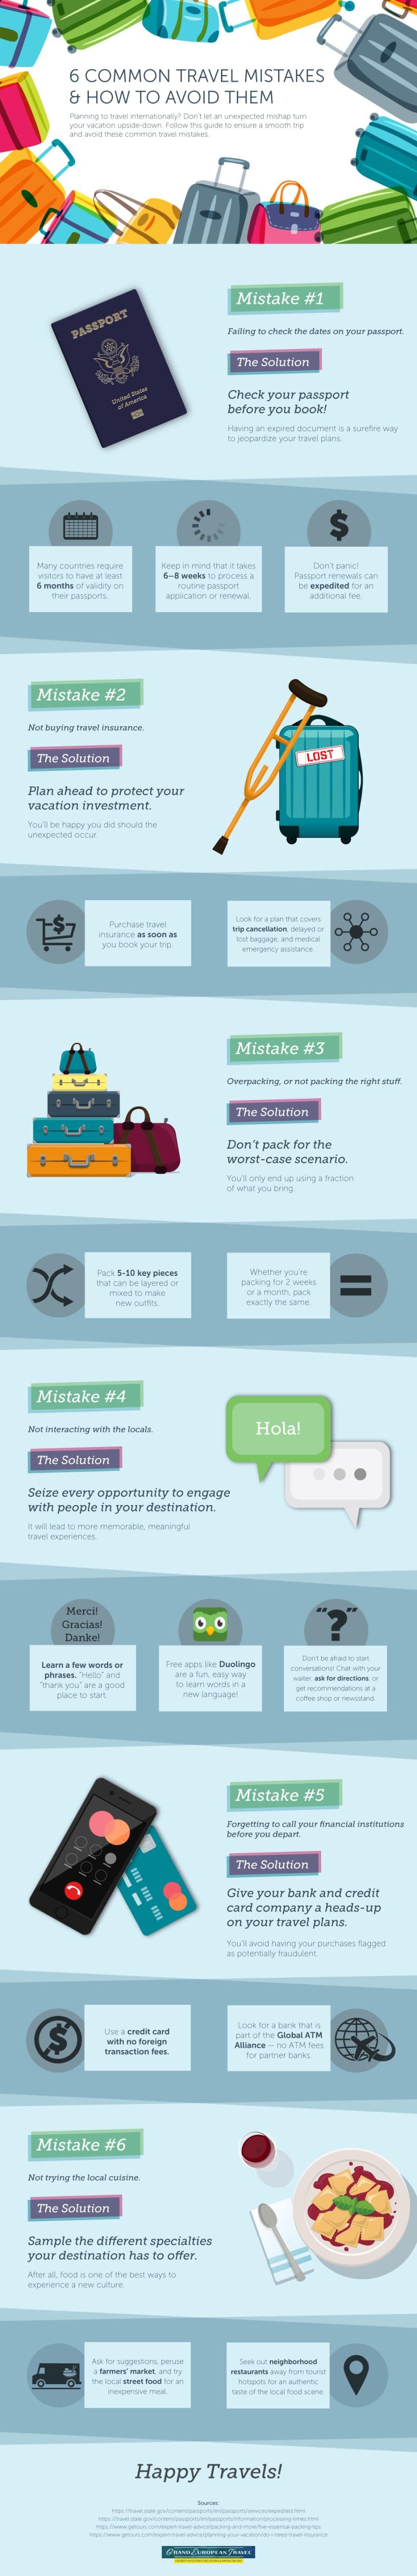 Common Travel Mistakes